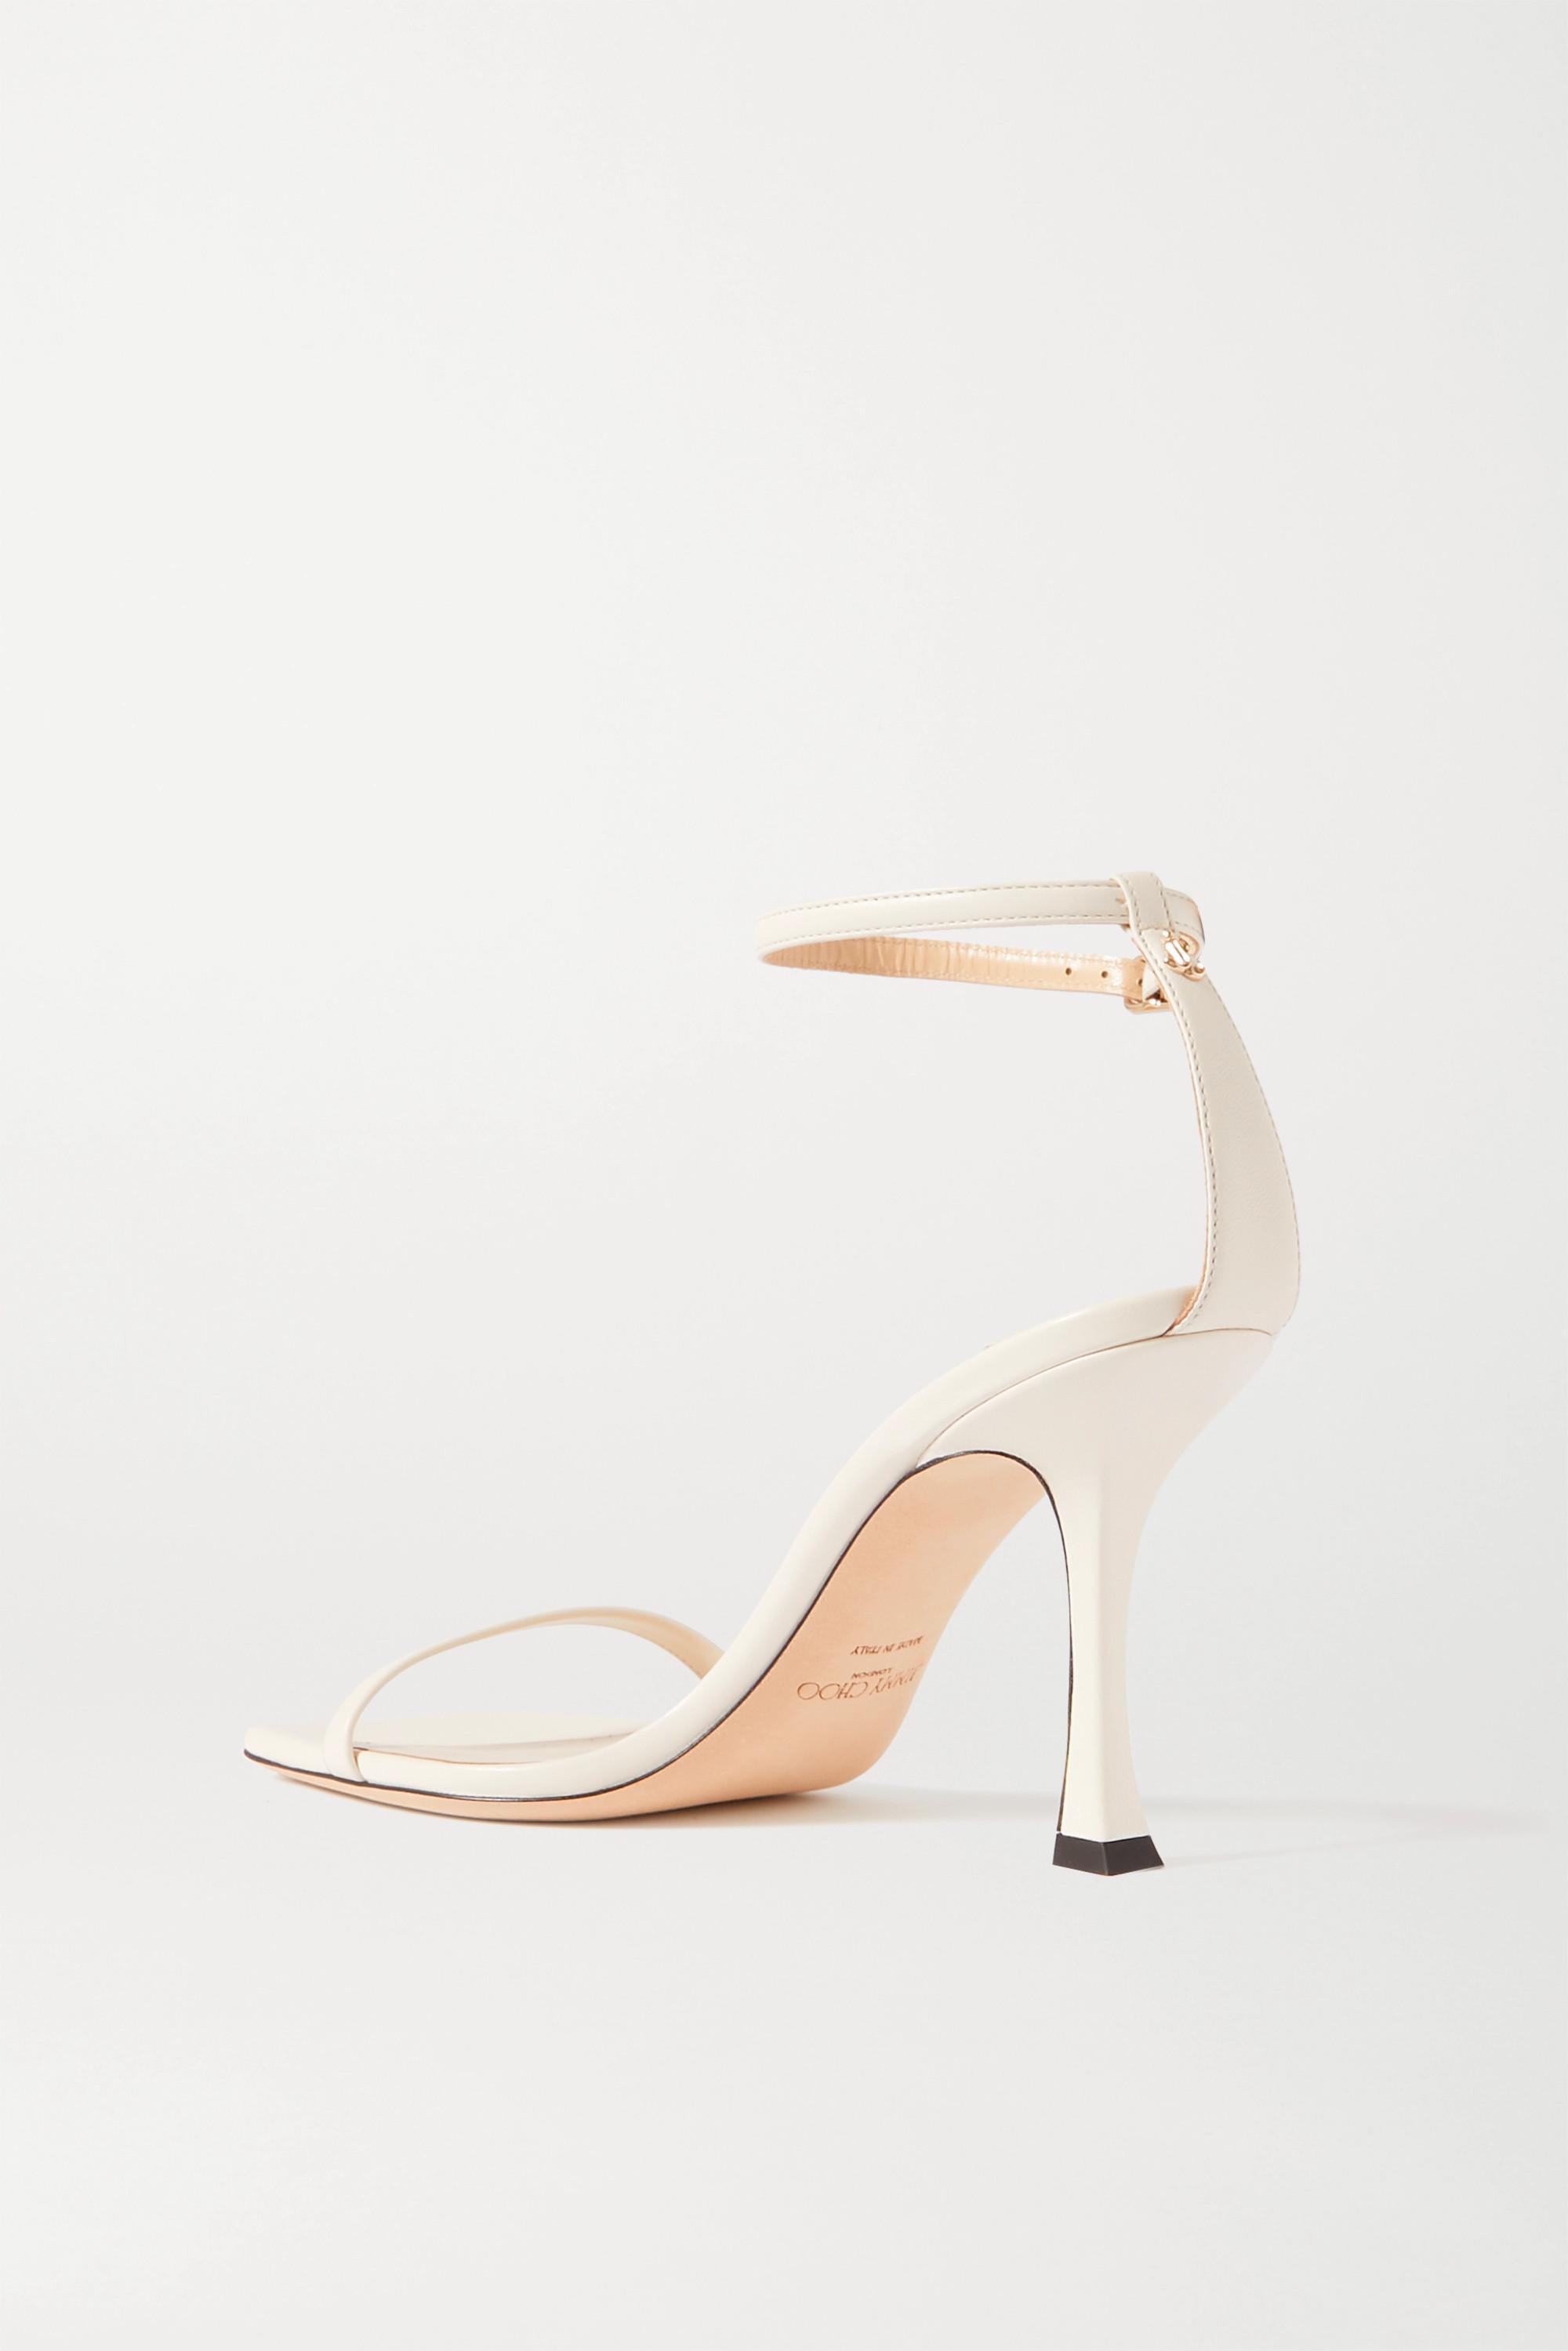 Jimmy Choo Marin 90 leather sandals